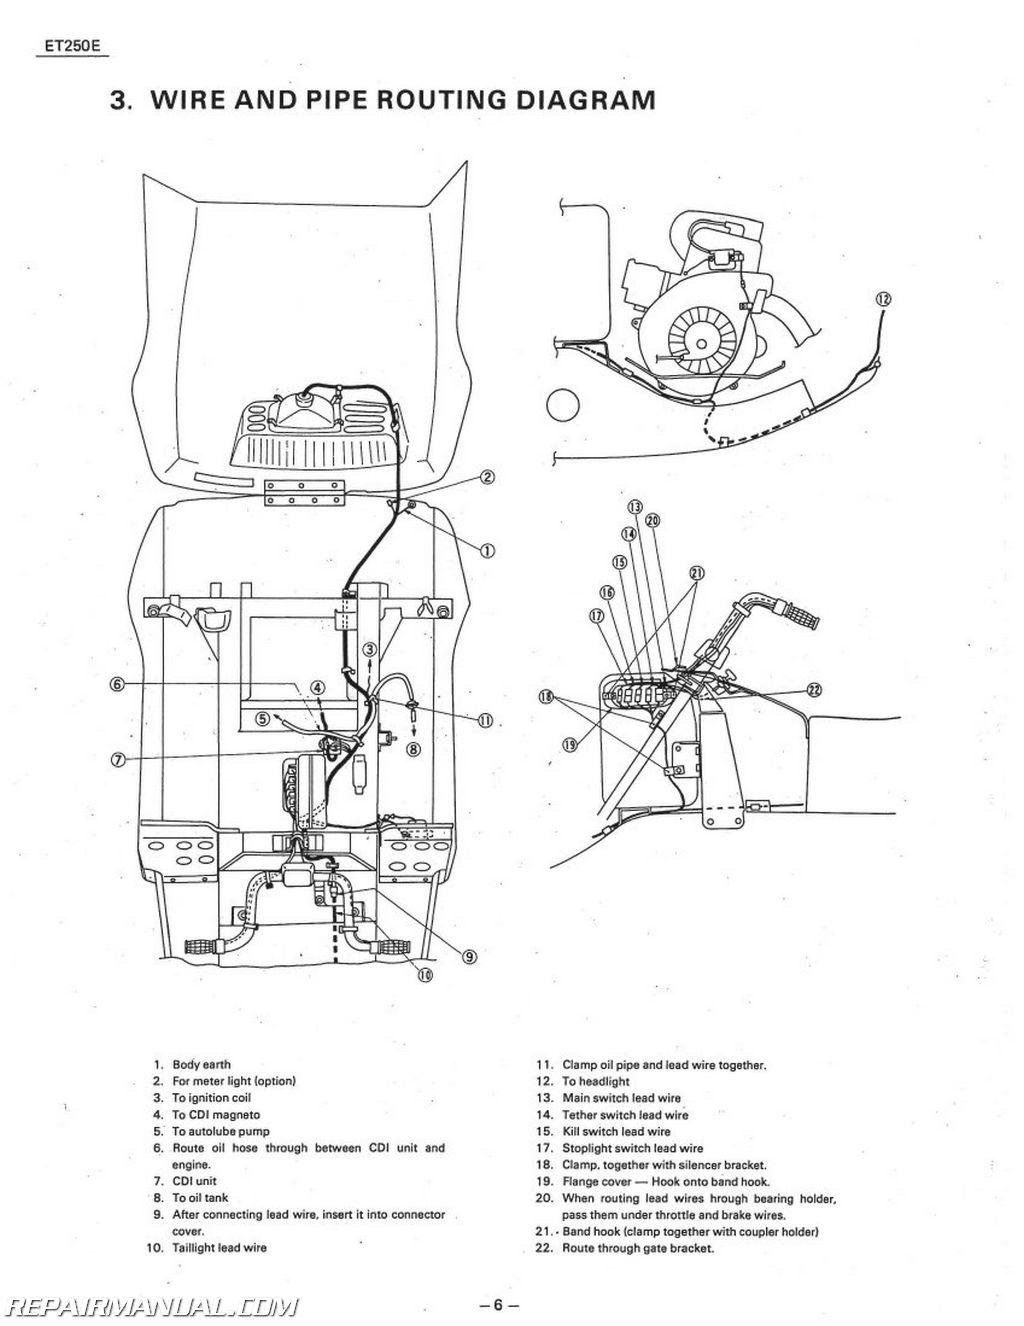 wire diagram yamaha enticer - wiring diagram ball-suspension-b -  ball-suspension-b.casatecla.it  casatecla.it